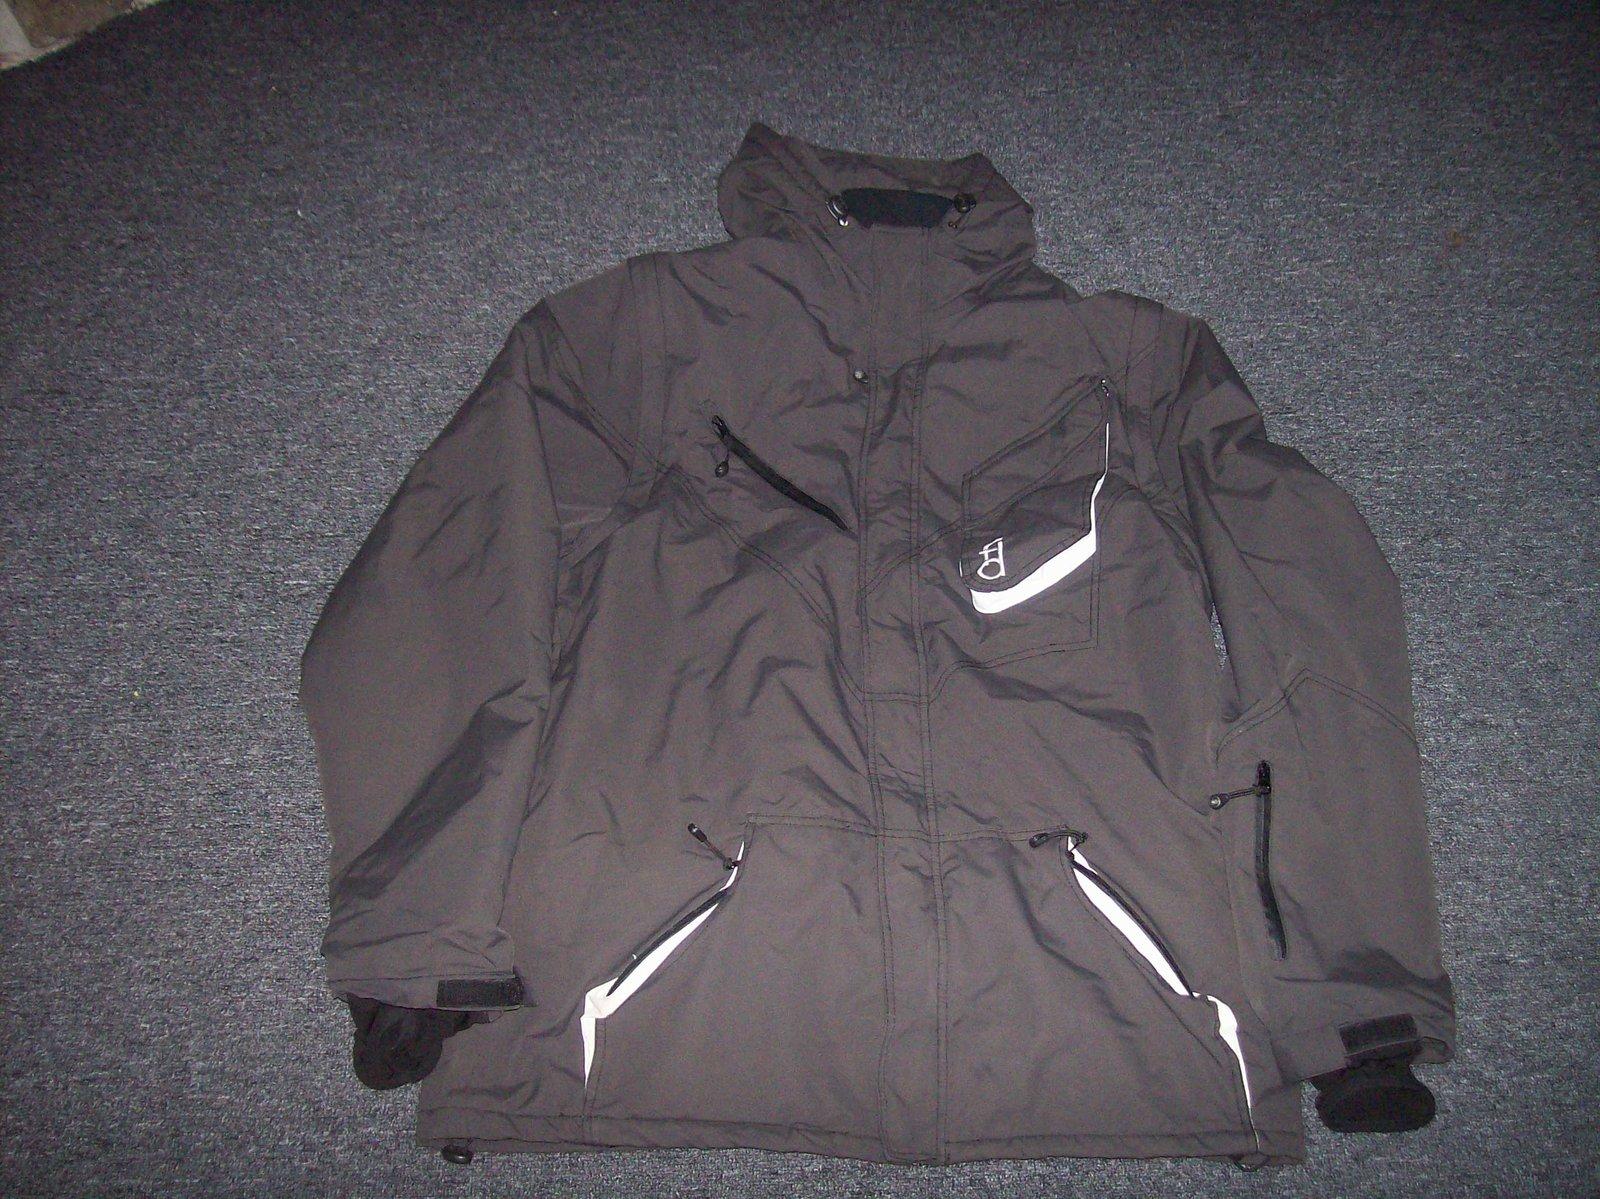 FD Jacket for sale